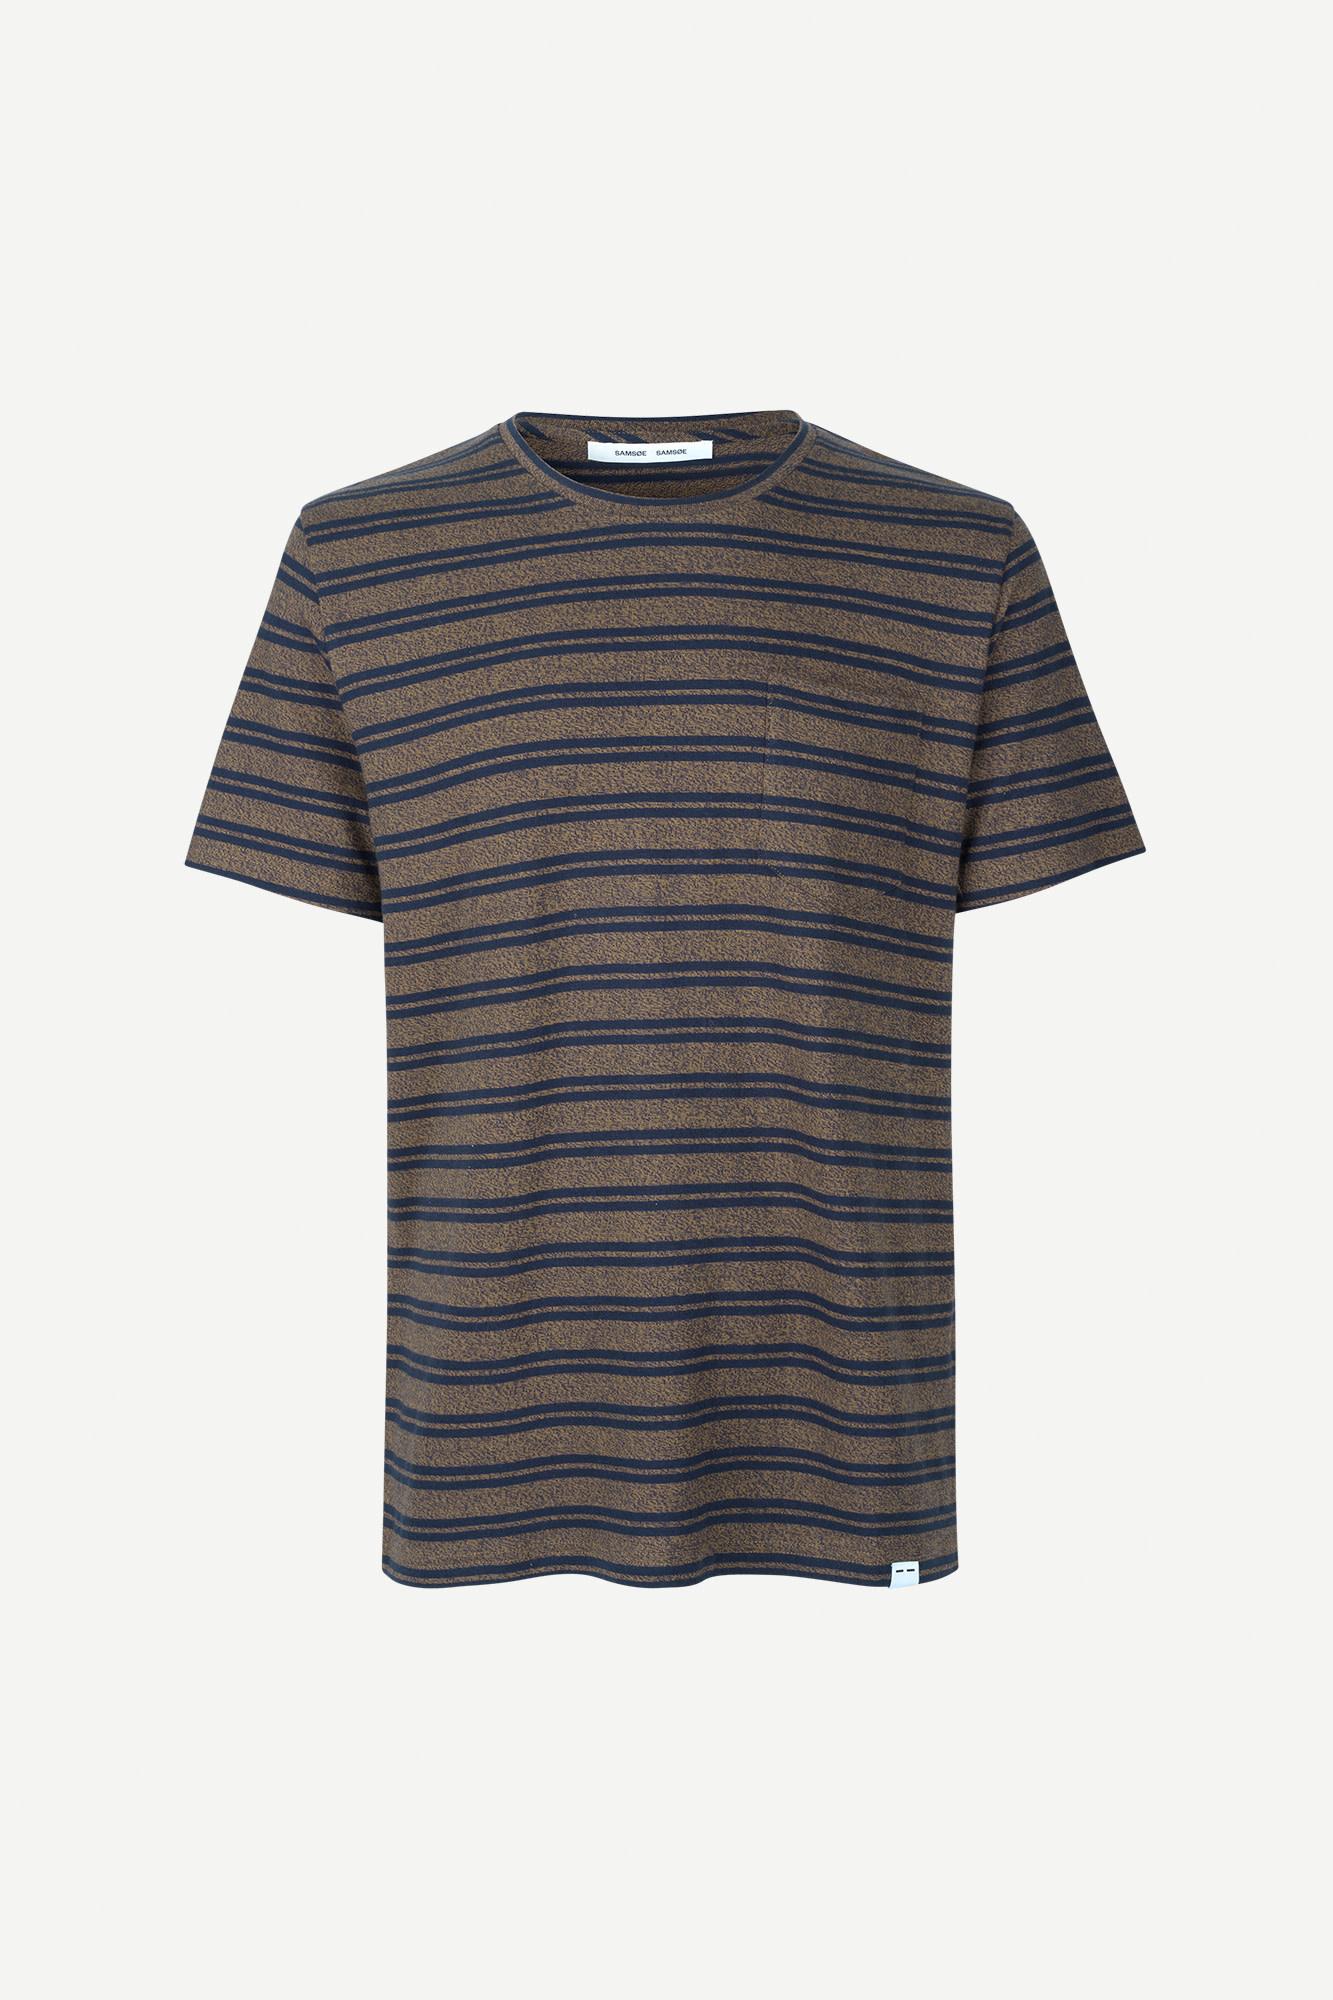 Carpo T-Shirt St Kangaroo Brown Blue Stripe 7888-4